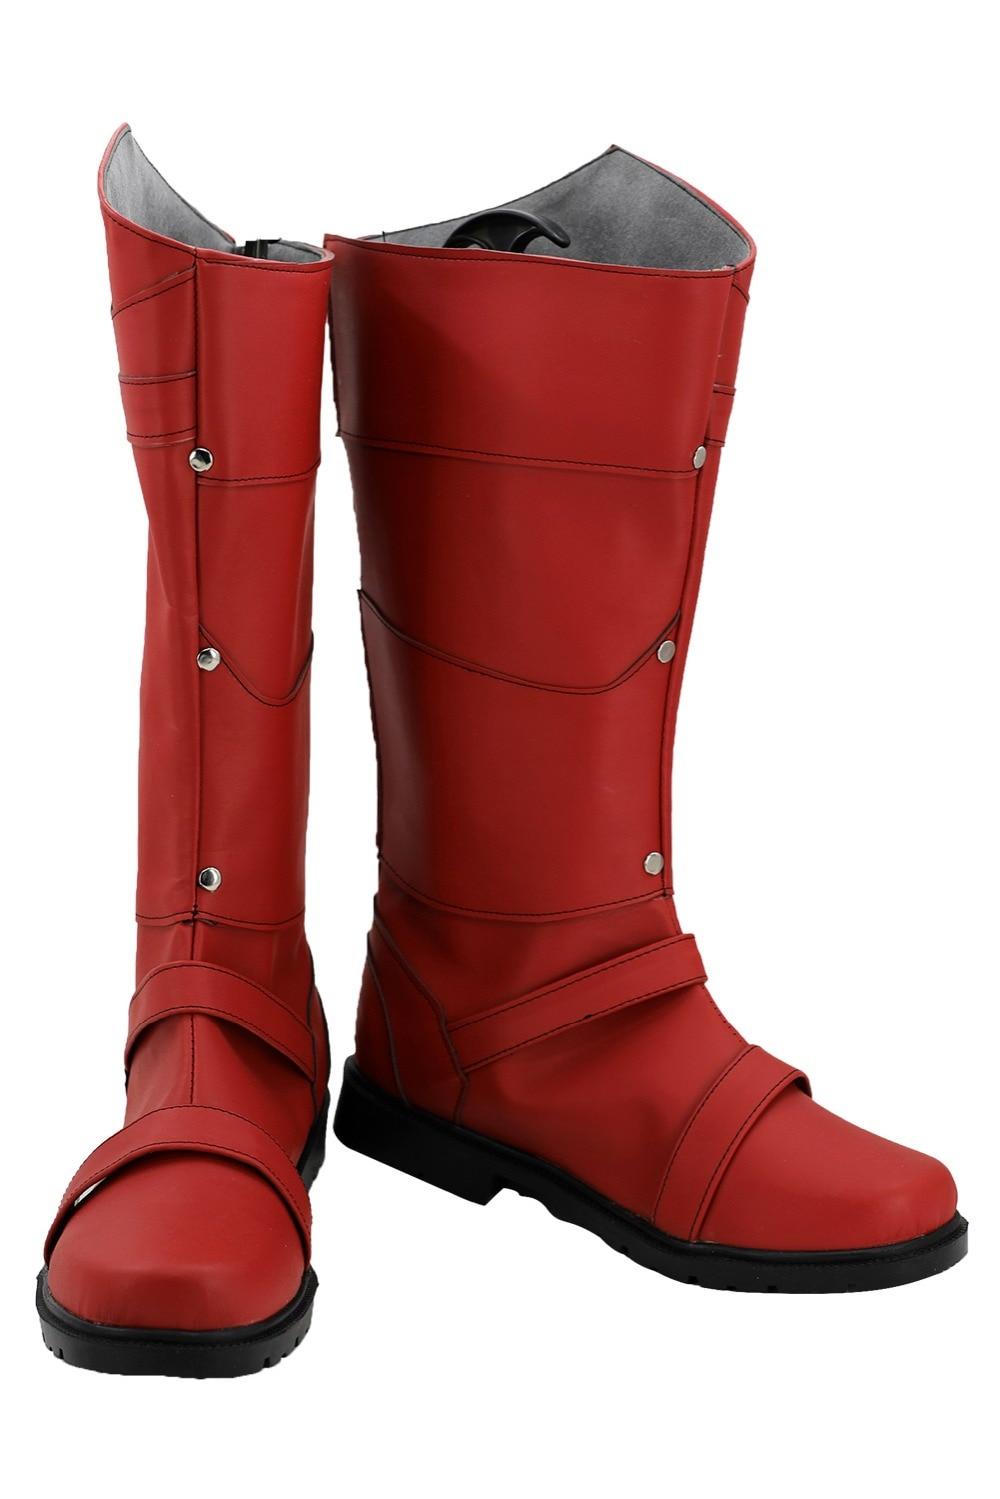 Cosplay X-men Max Eisenhardt Magneto Cosplay Boots Shoes Adult Men Superhero Cosplay Costume Custom Made European Size